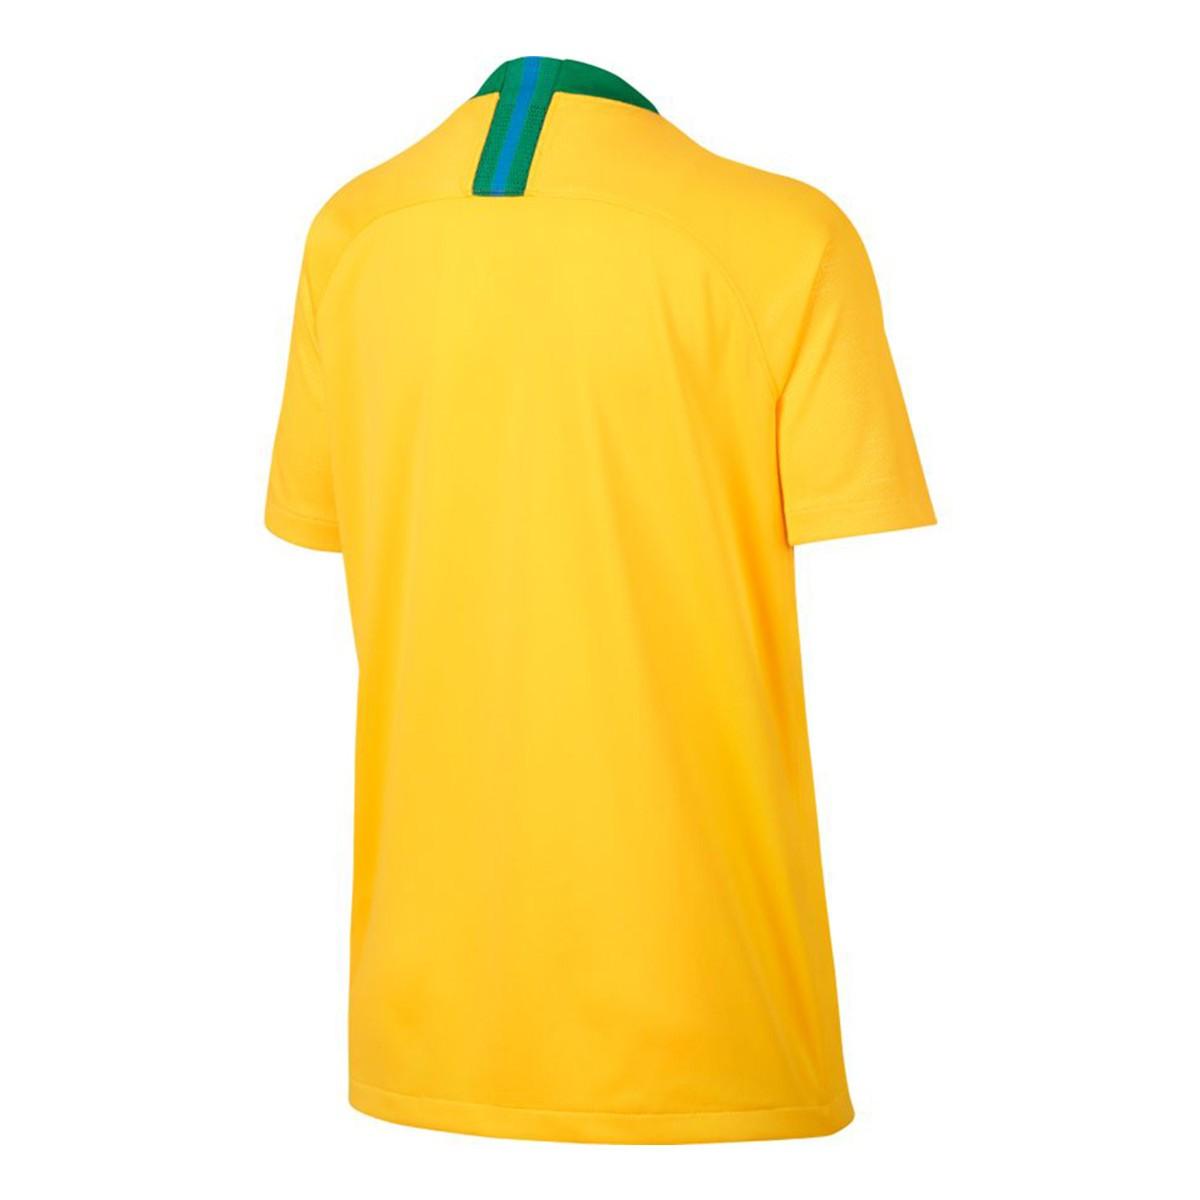 Camiseta Nike Brasil Breathe Stadium Primera Equipación 2018-2019 Niño  Midwest gold-Lucky green - Soloporteros es ahora Fútbol Emotion 502a2a2b3f446